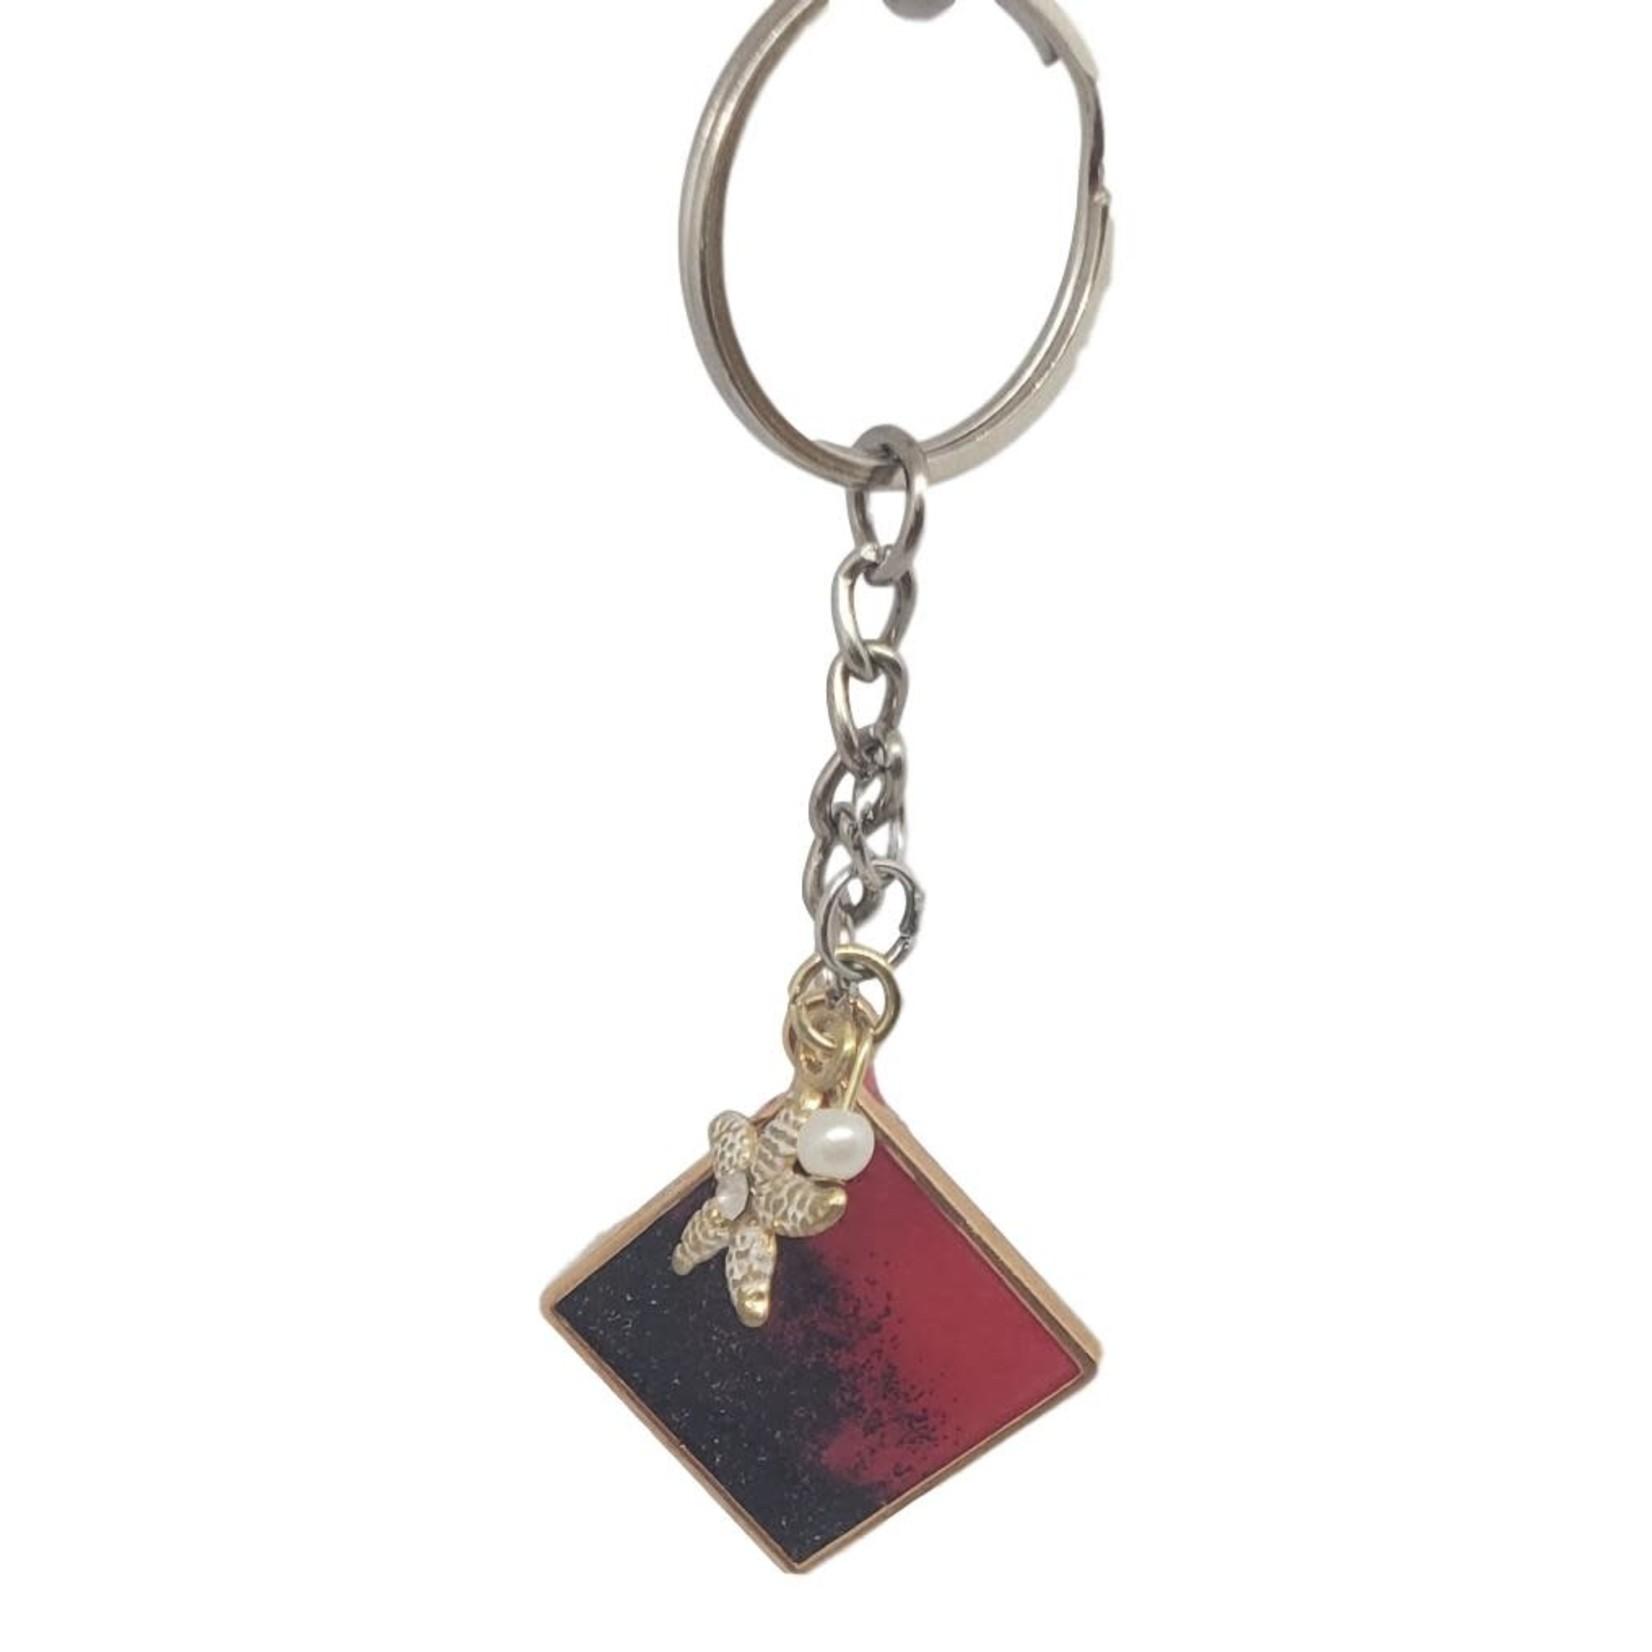 East Coast Sirens Red & Black Pendant Key Chain